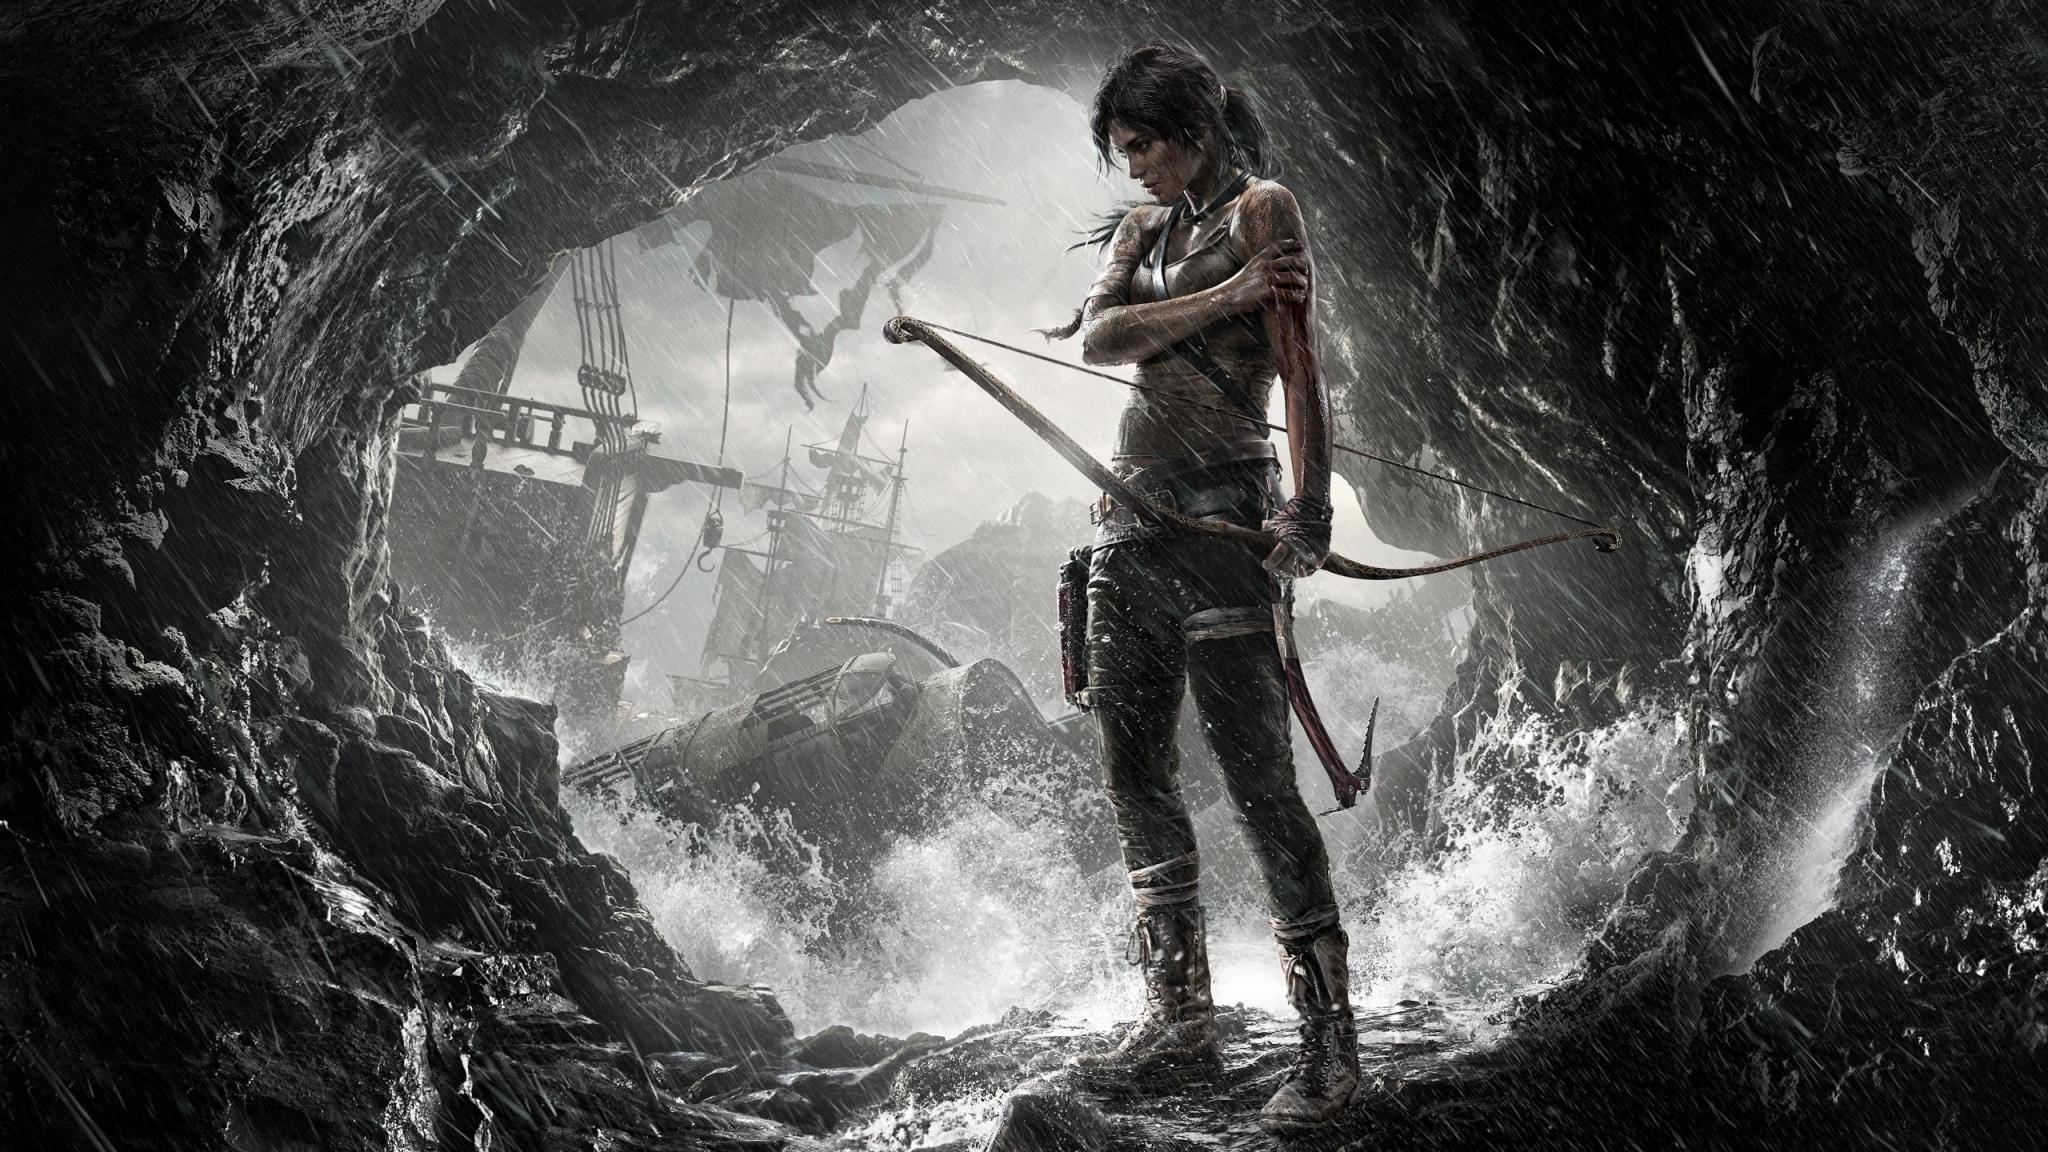 7680x4320 Lara Croft 8k Artwork 8k Hd 4k Wallpapers: Tomb Raider 2 Game Art, Full HD 2K Wallpaper